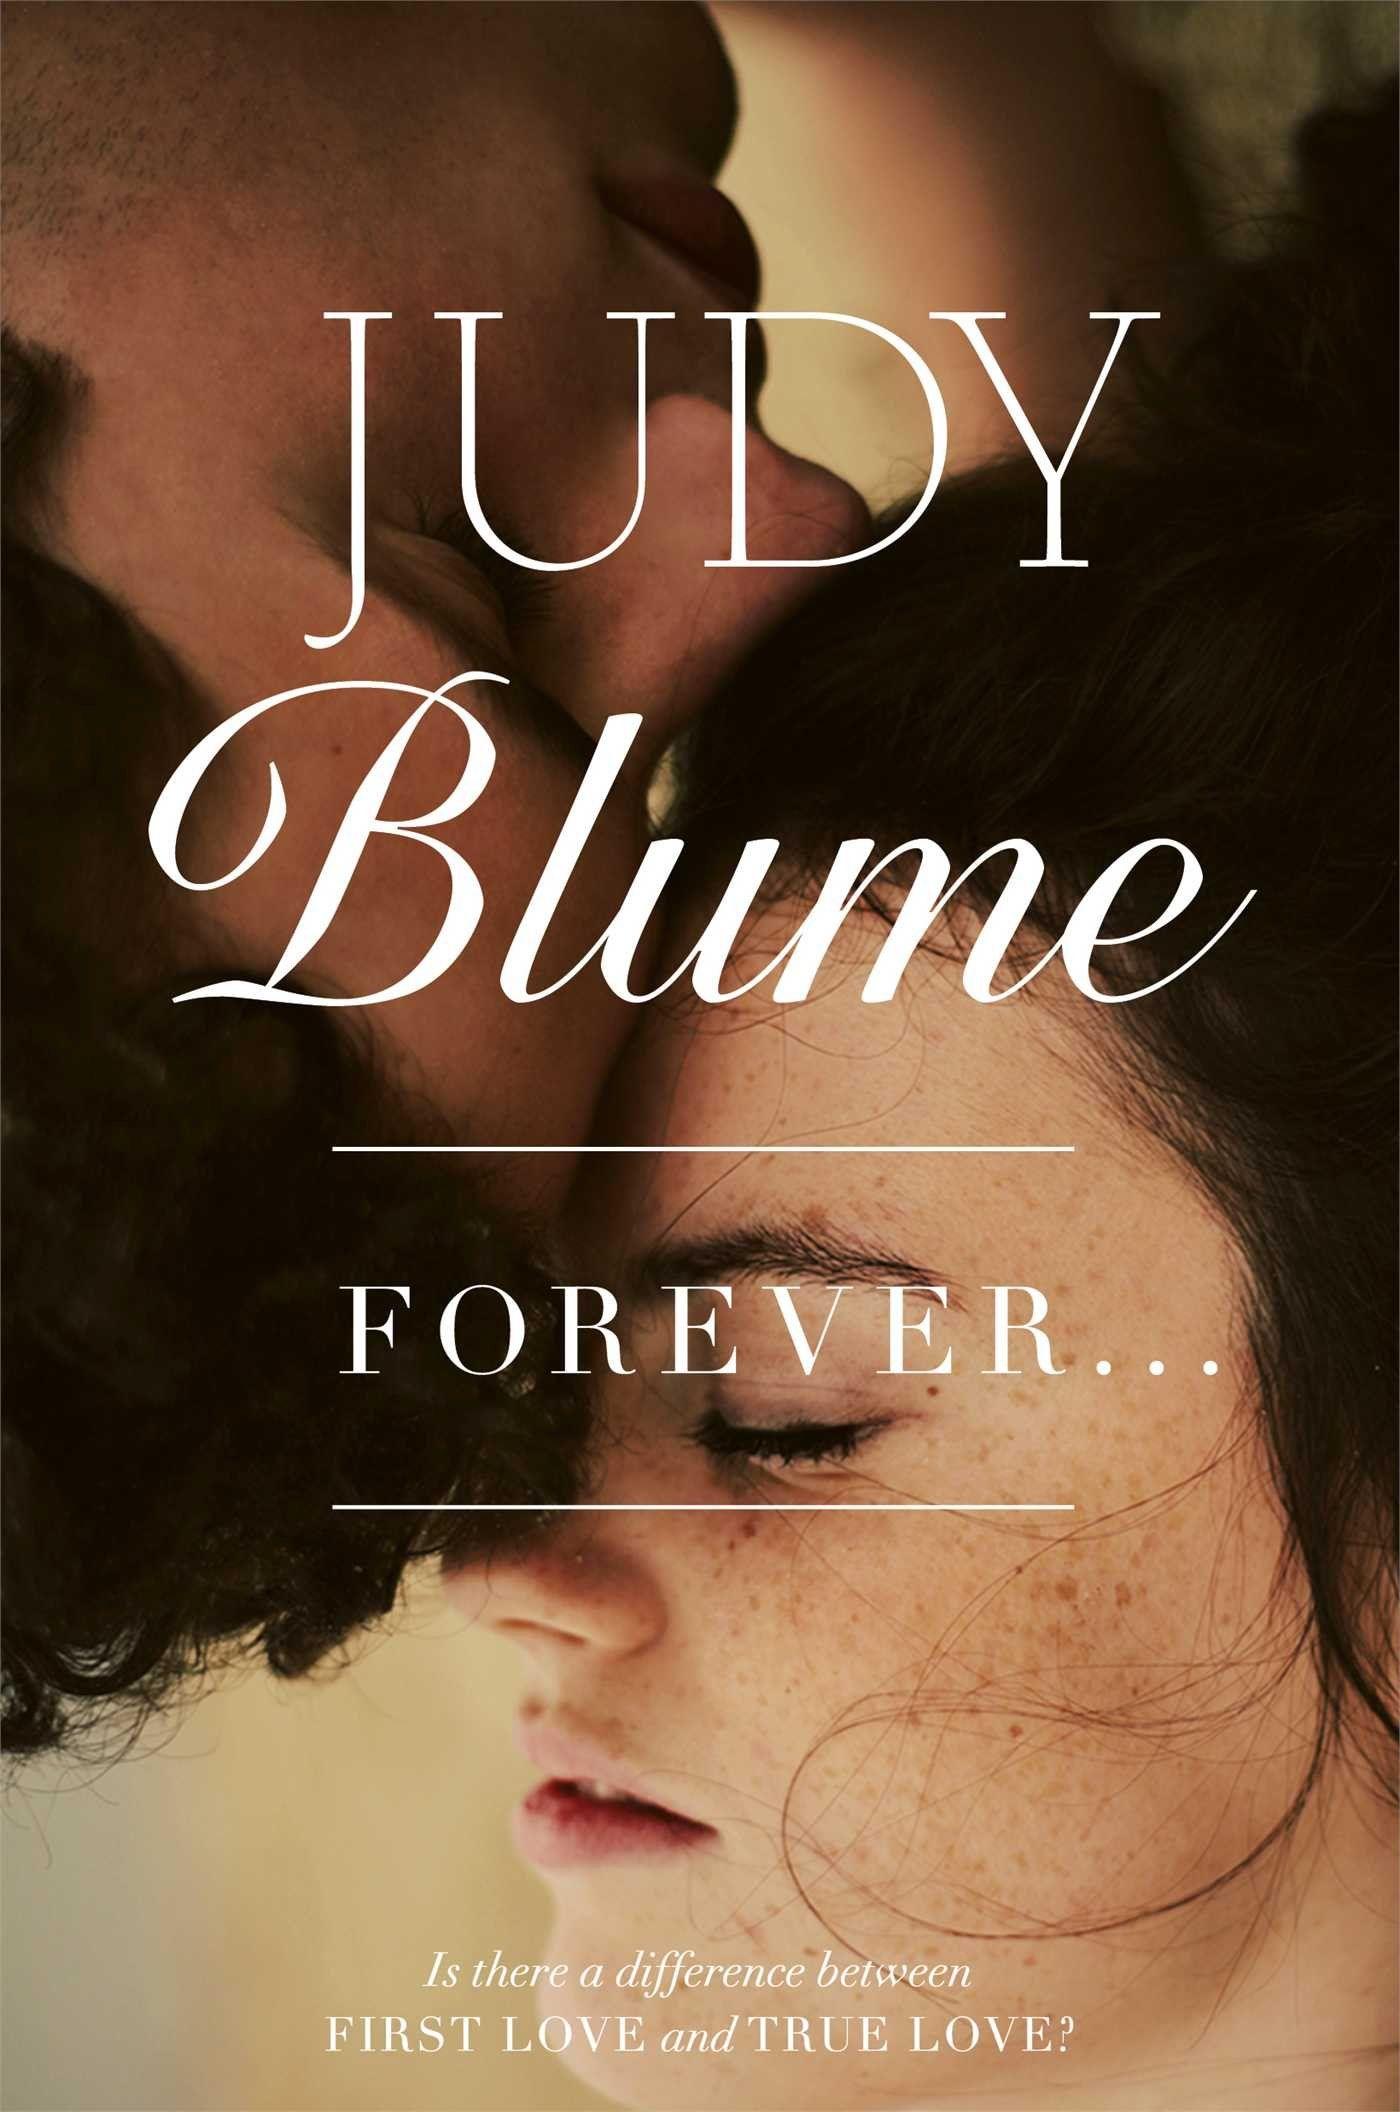 Forever Judy Blume Pdf Free